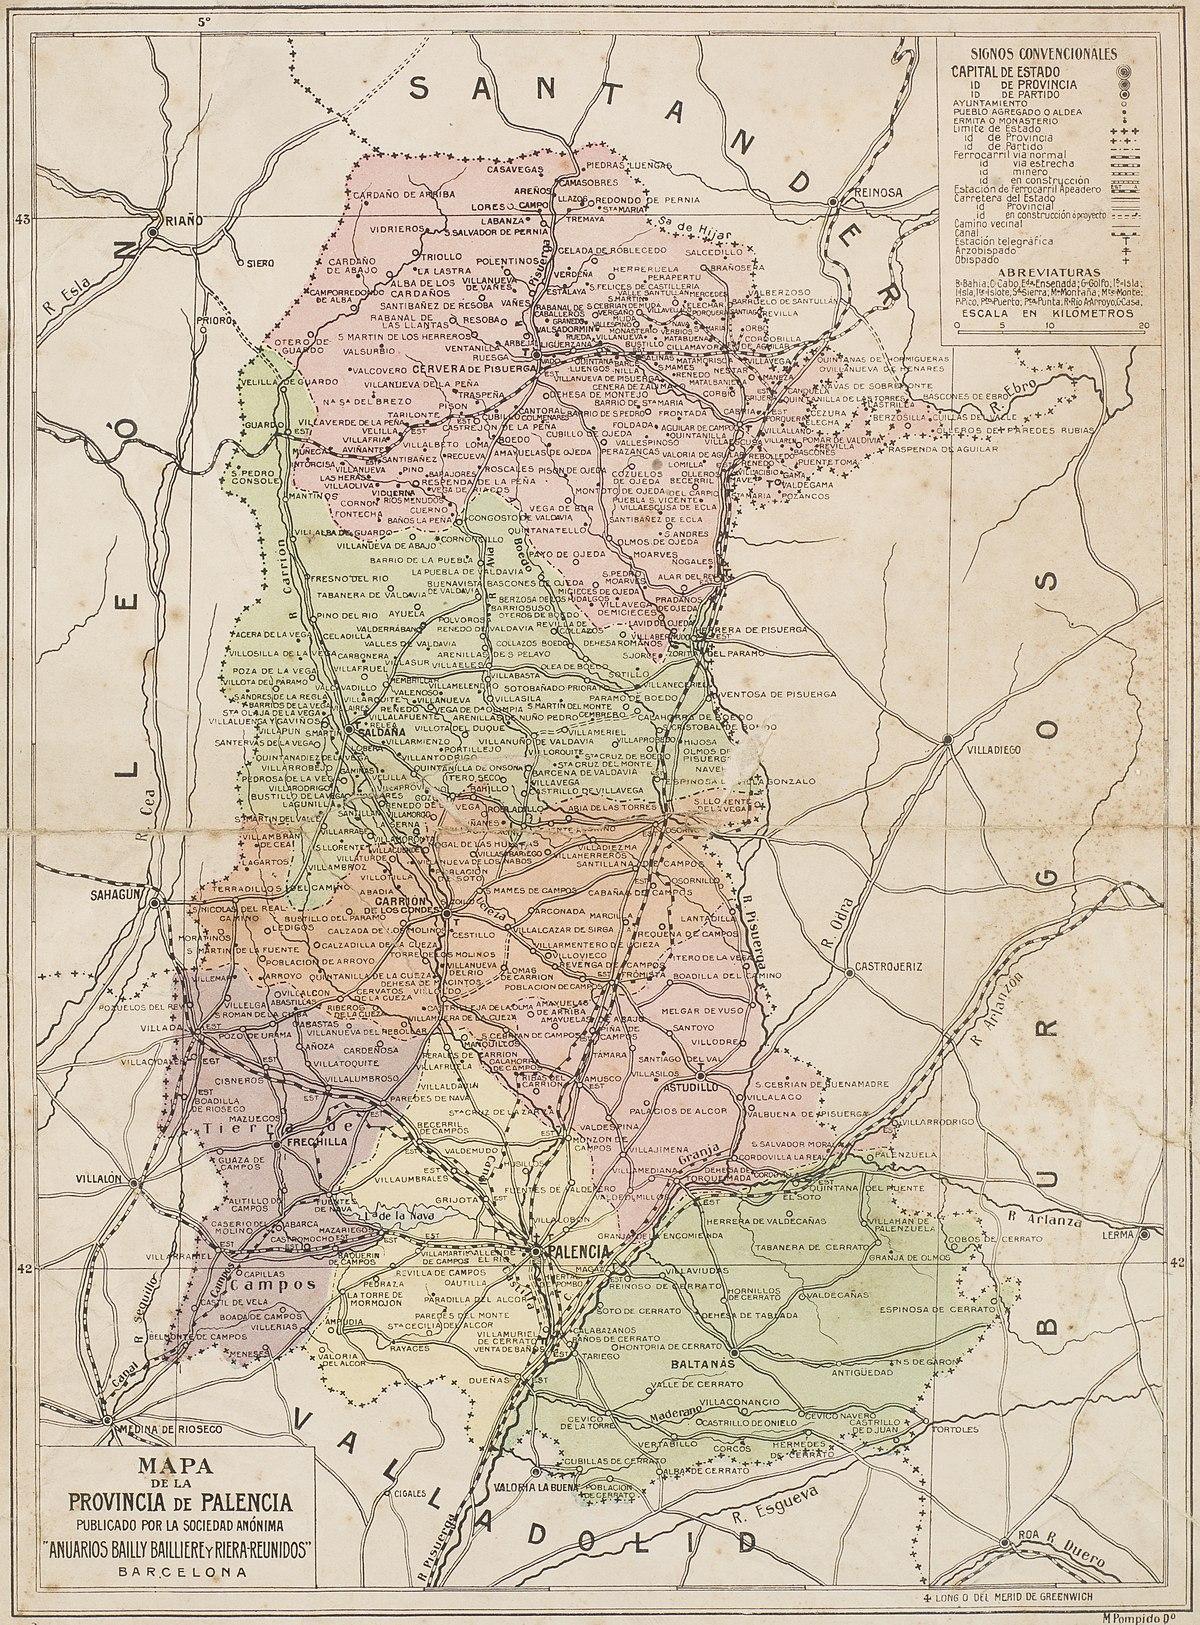 Provincia De Palencia Mapa.Mapa De La Provincia De Palencia Wikidata